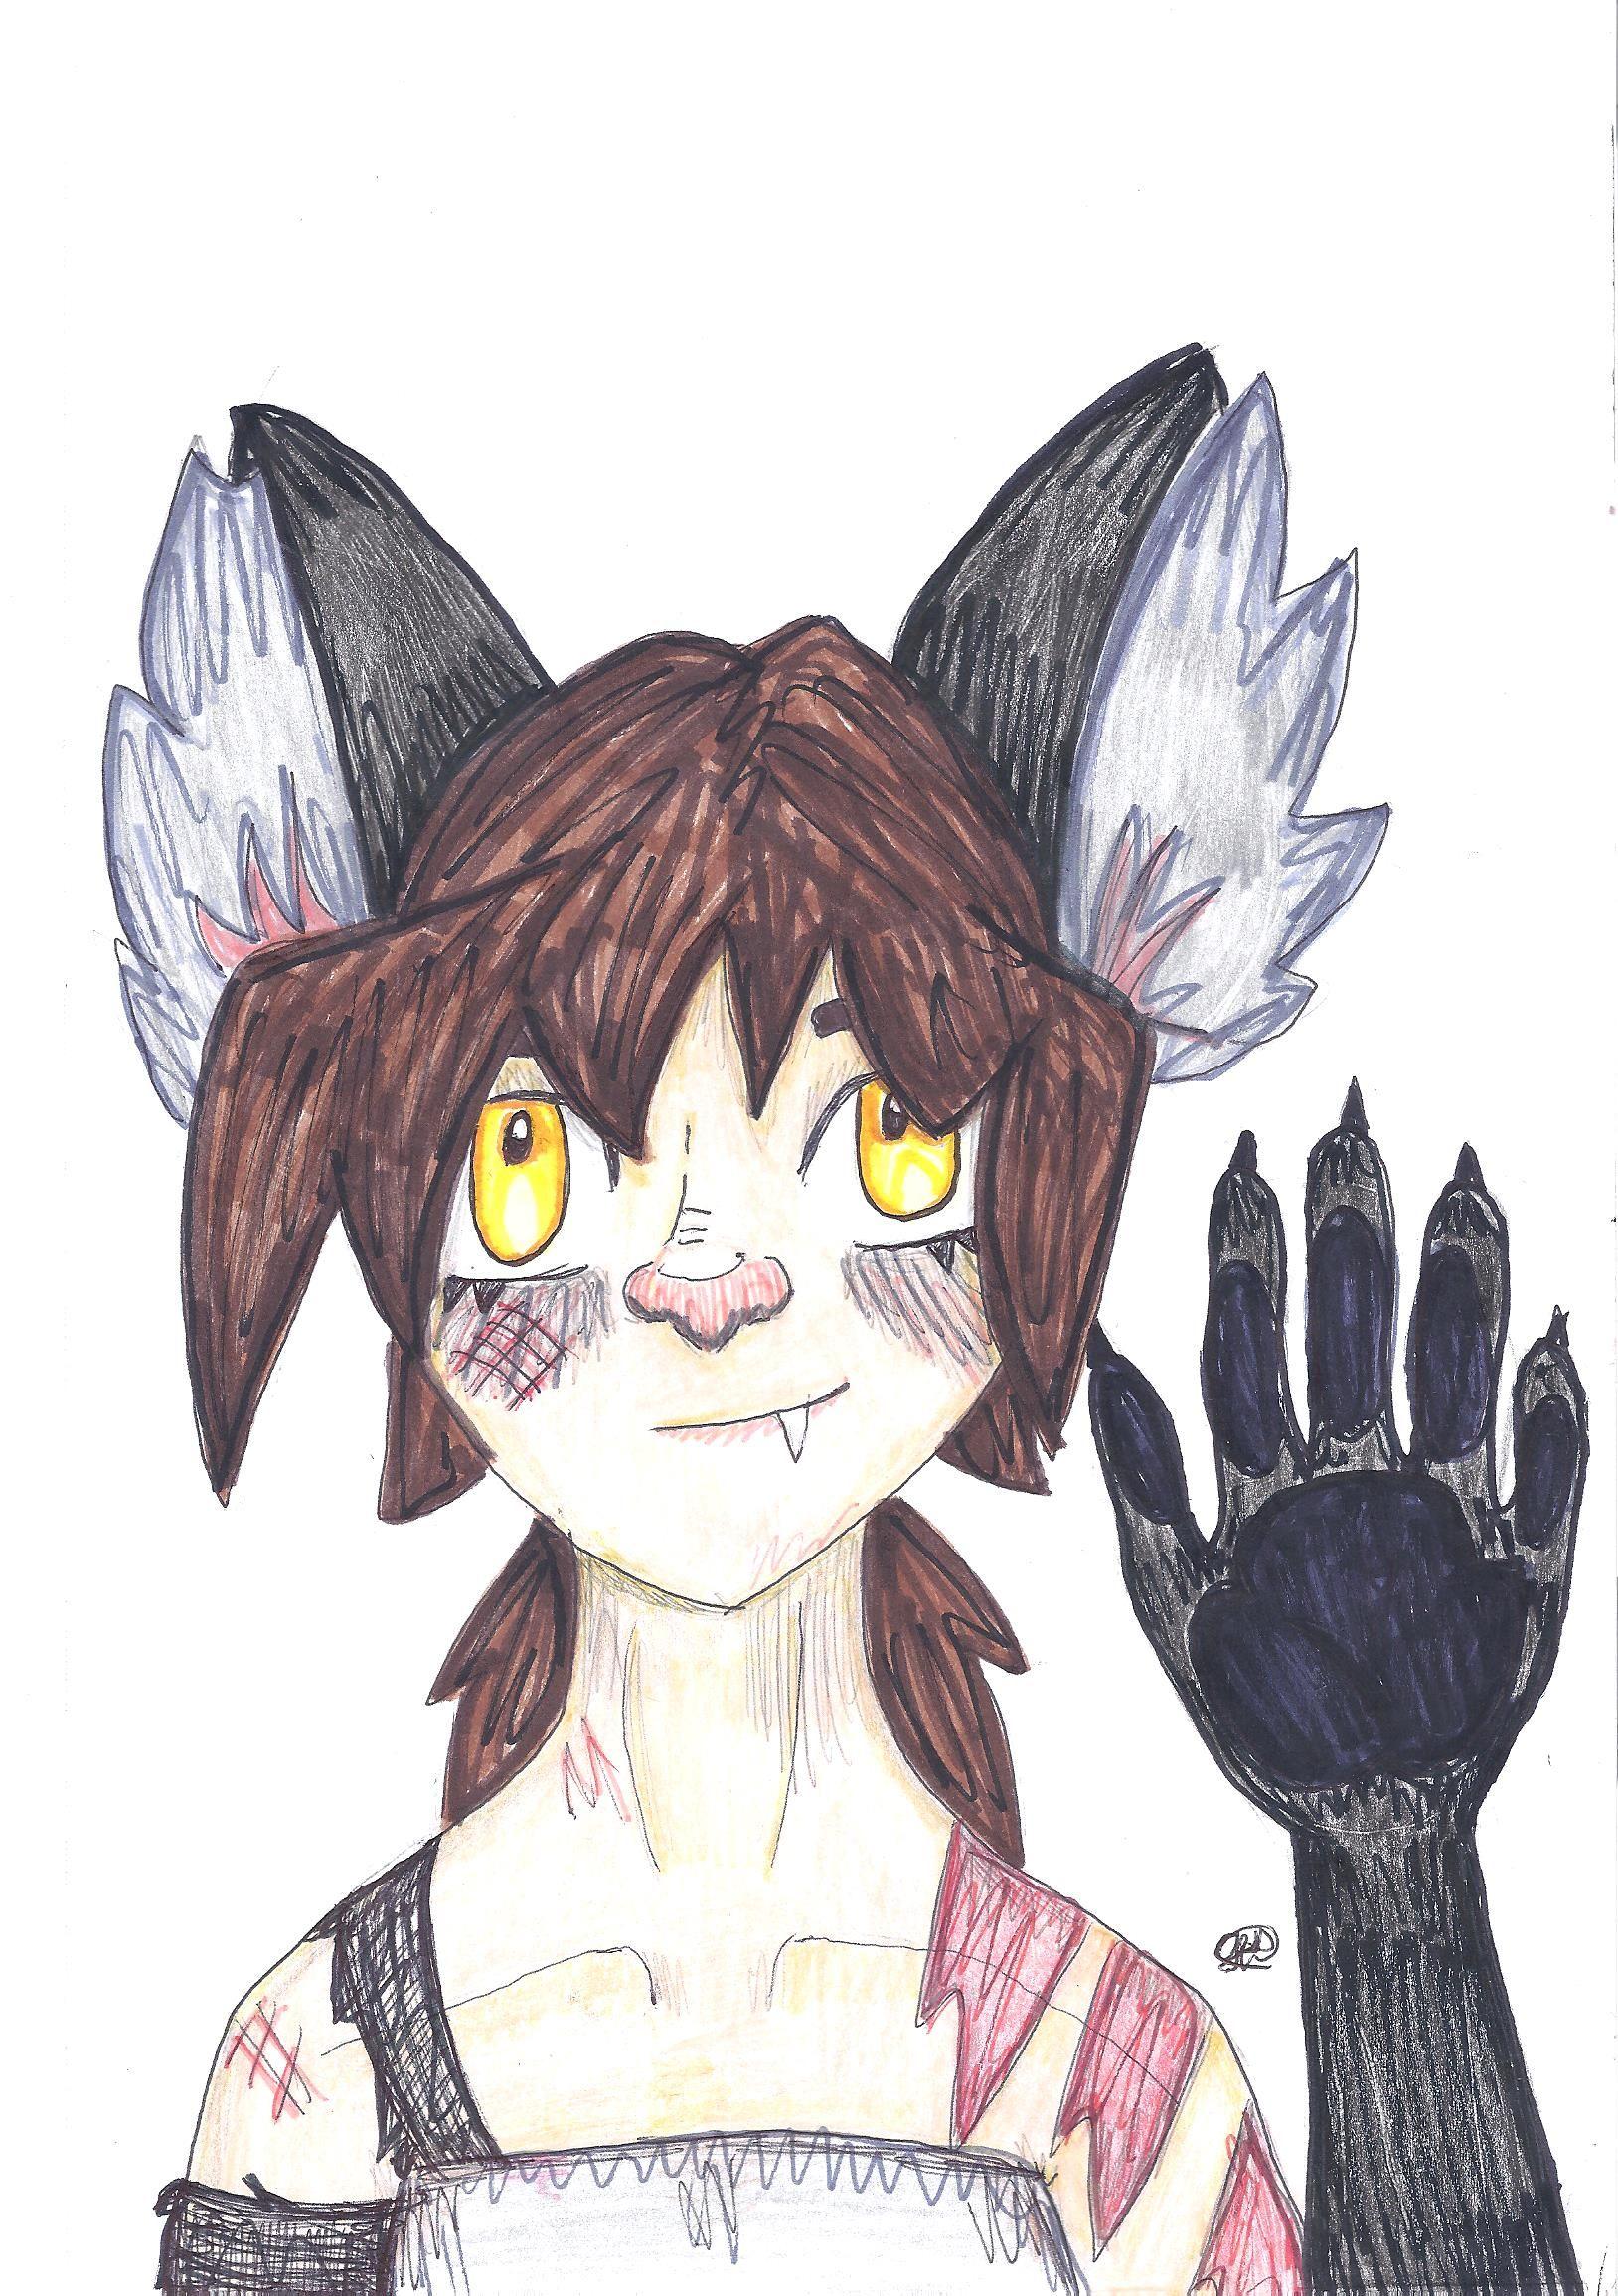 Its Kaelie my OC, the hand is a bit weird but whatever...